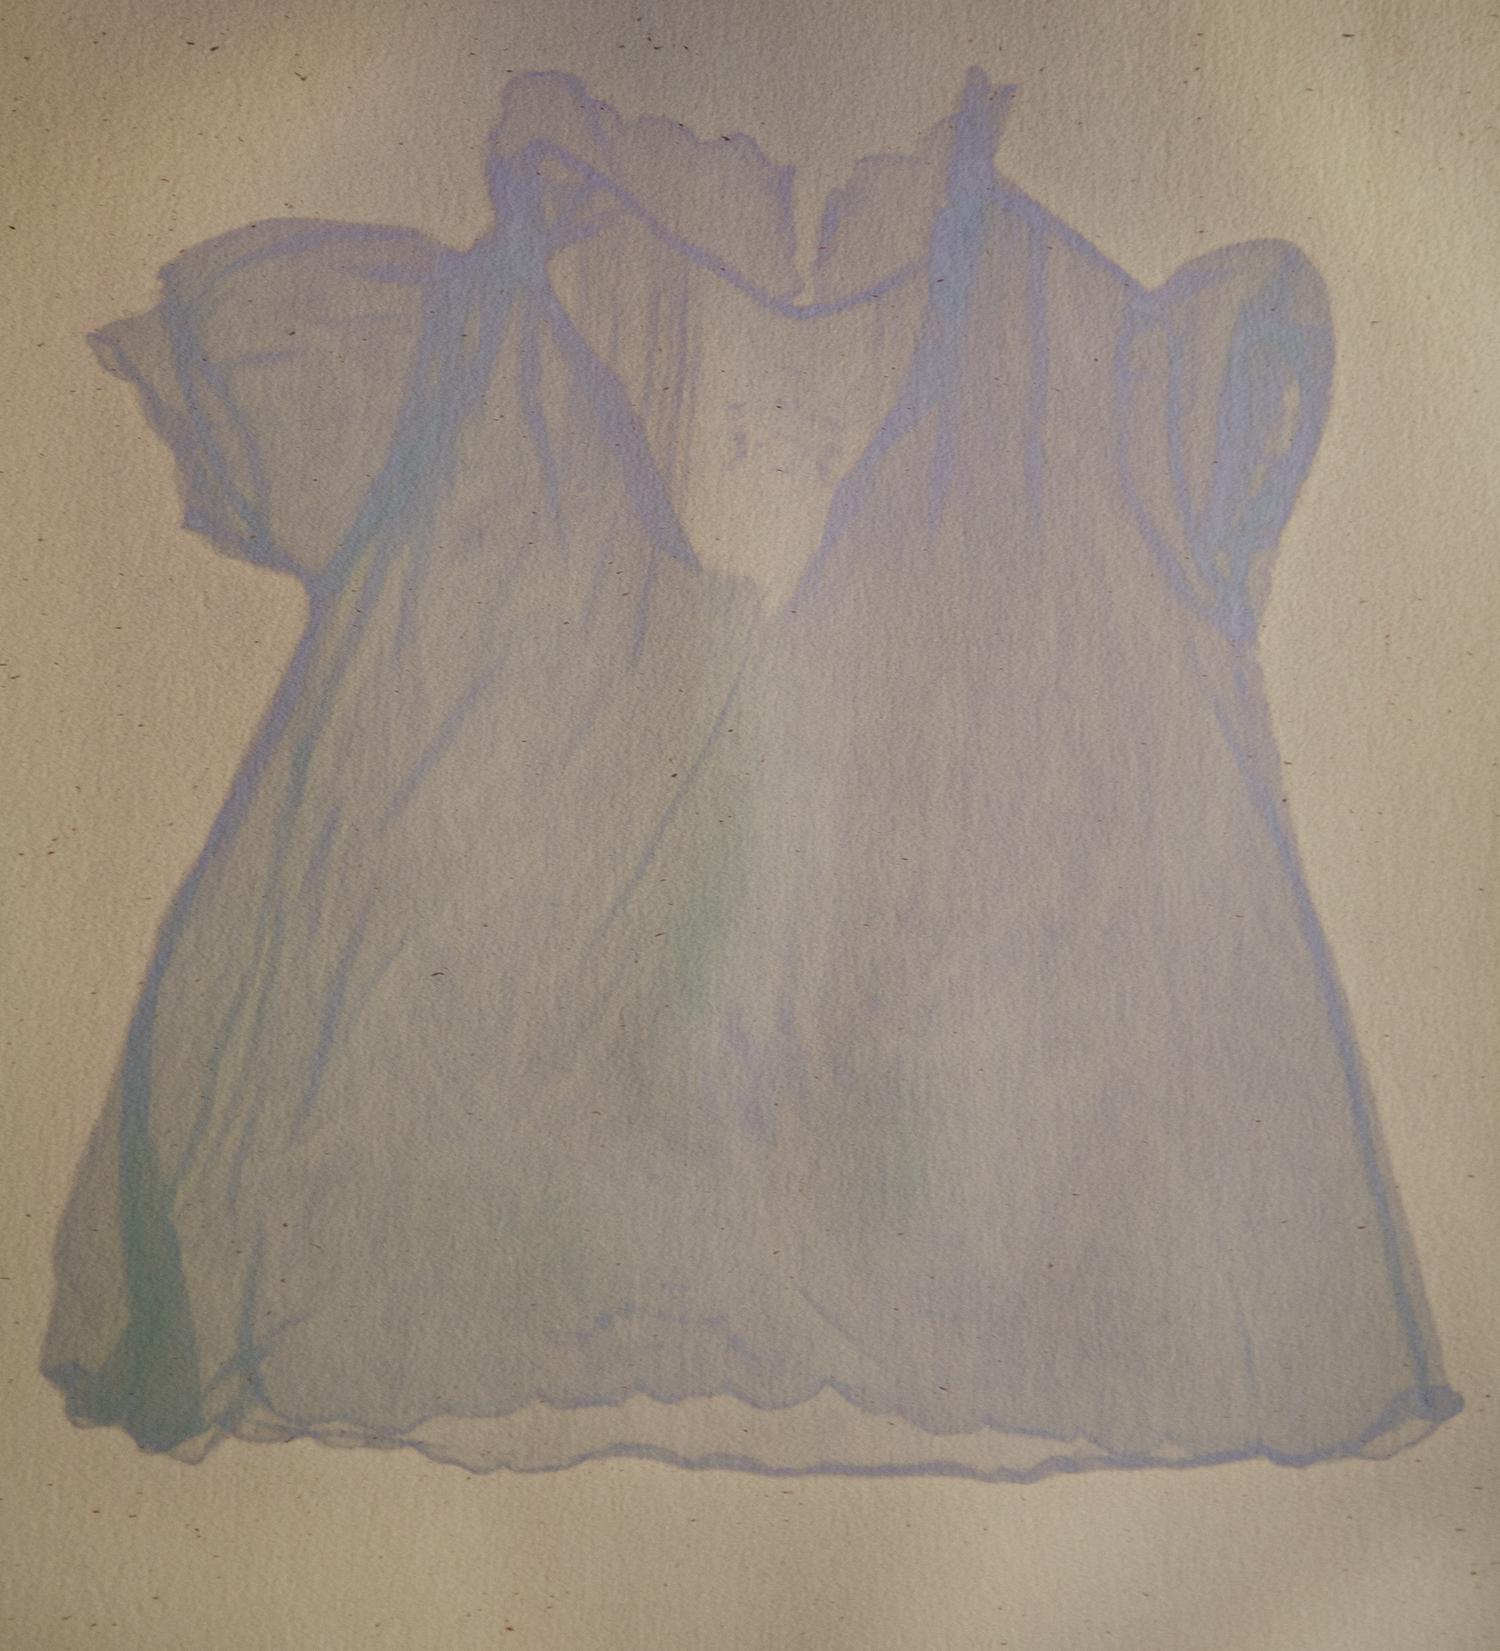 """Lavender Dress"" by Samantha VanDeman"